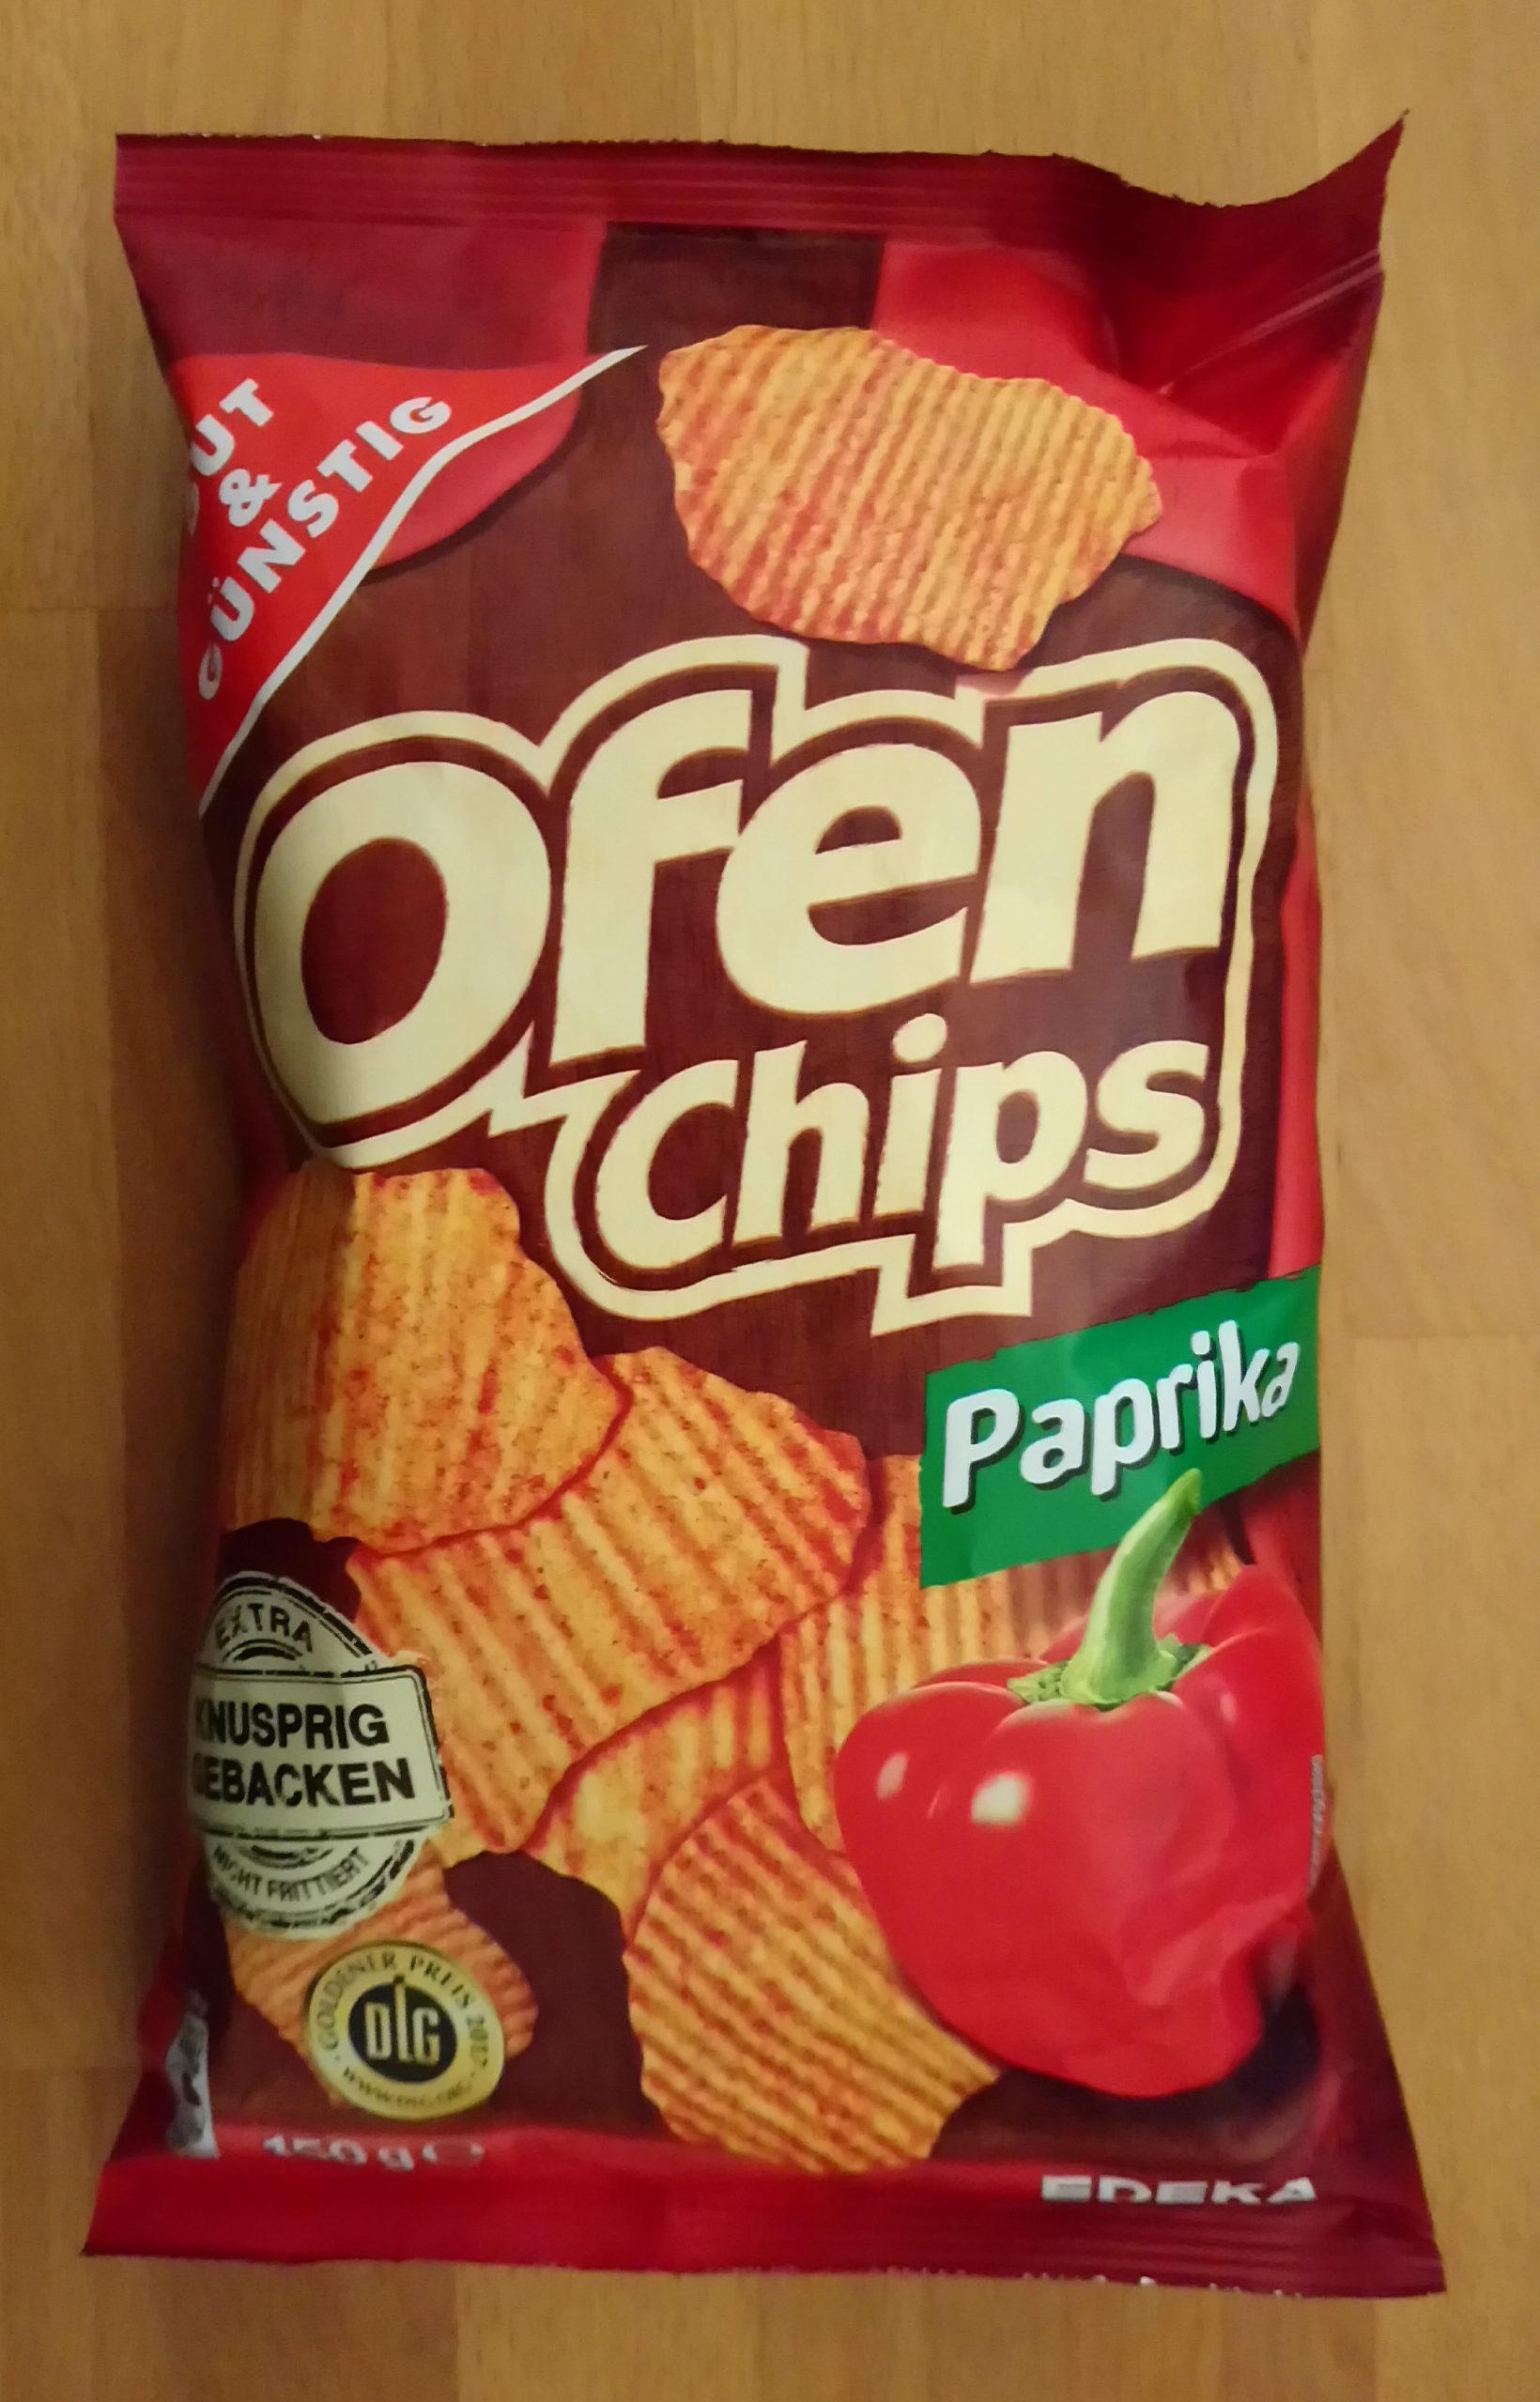 Ofenchips Paprika - Produkt